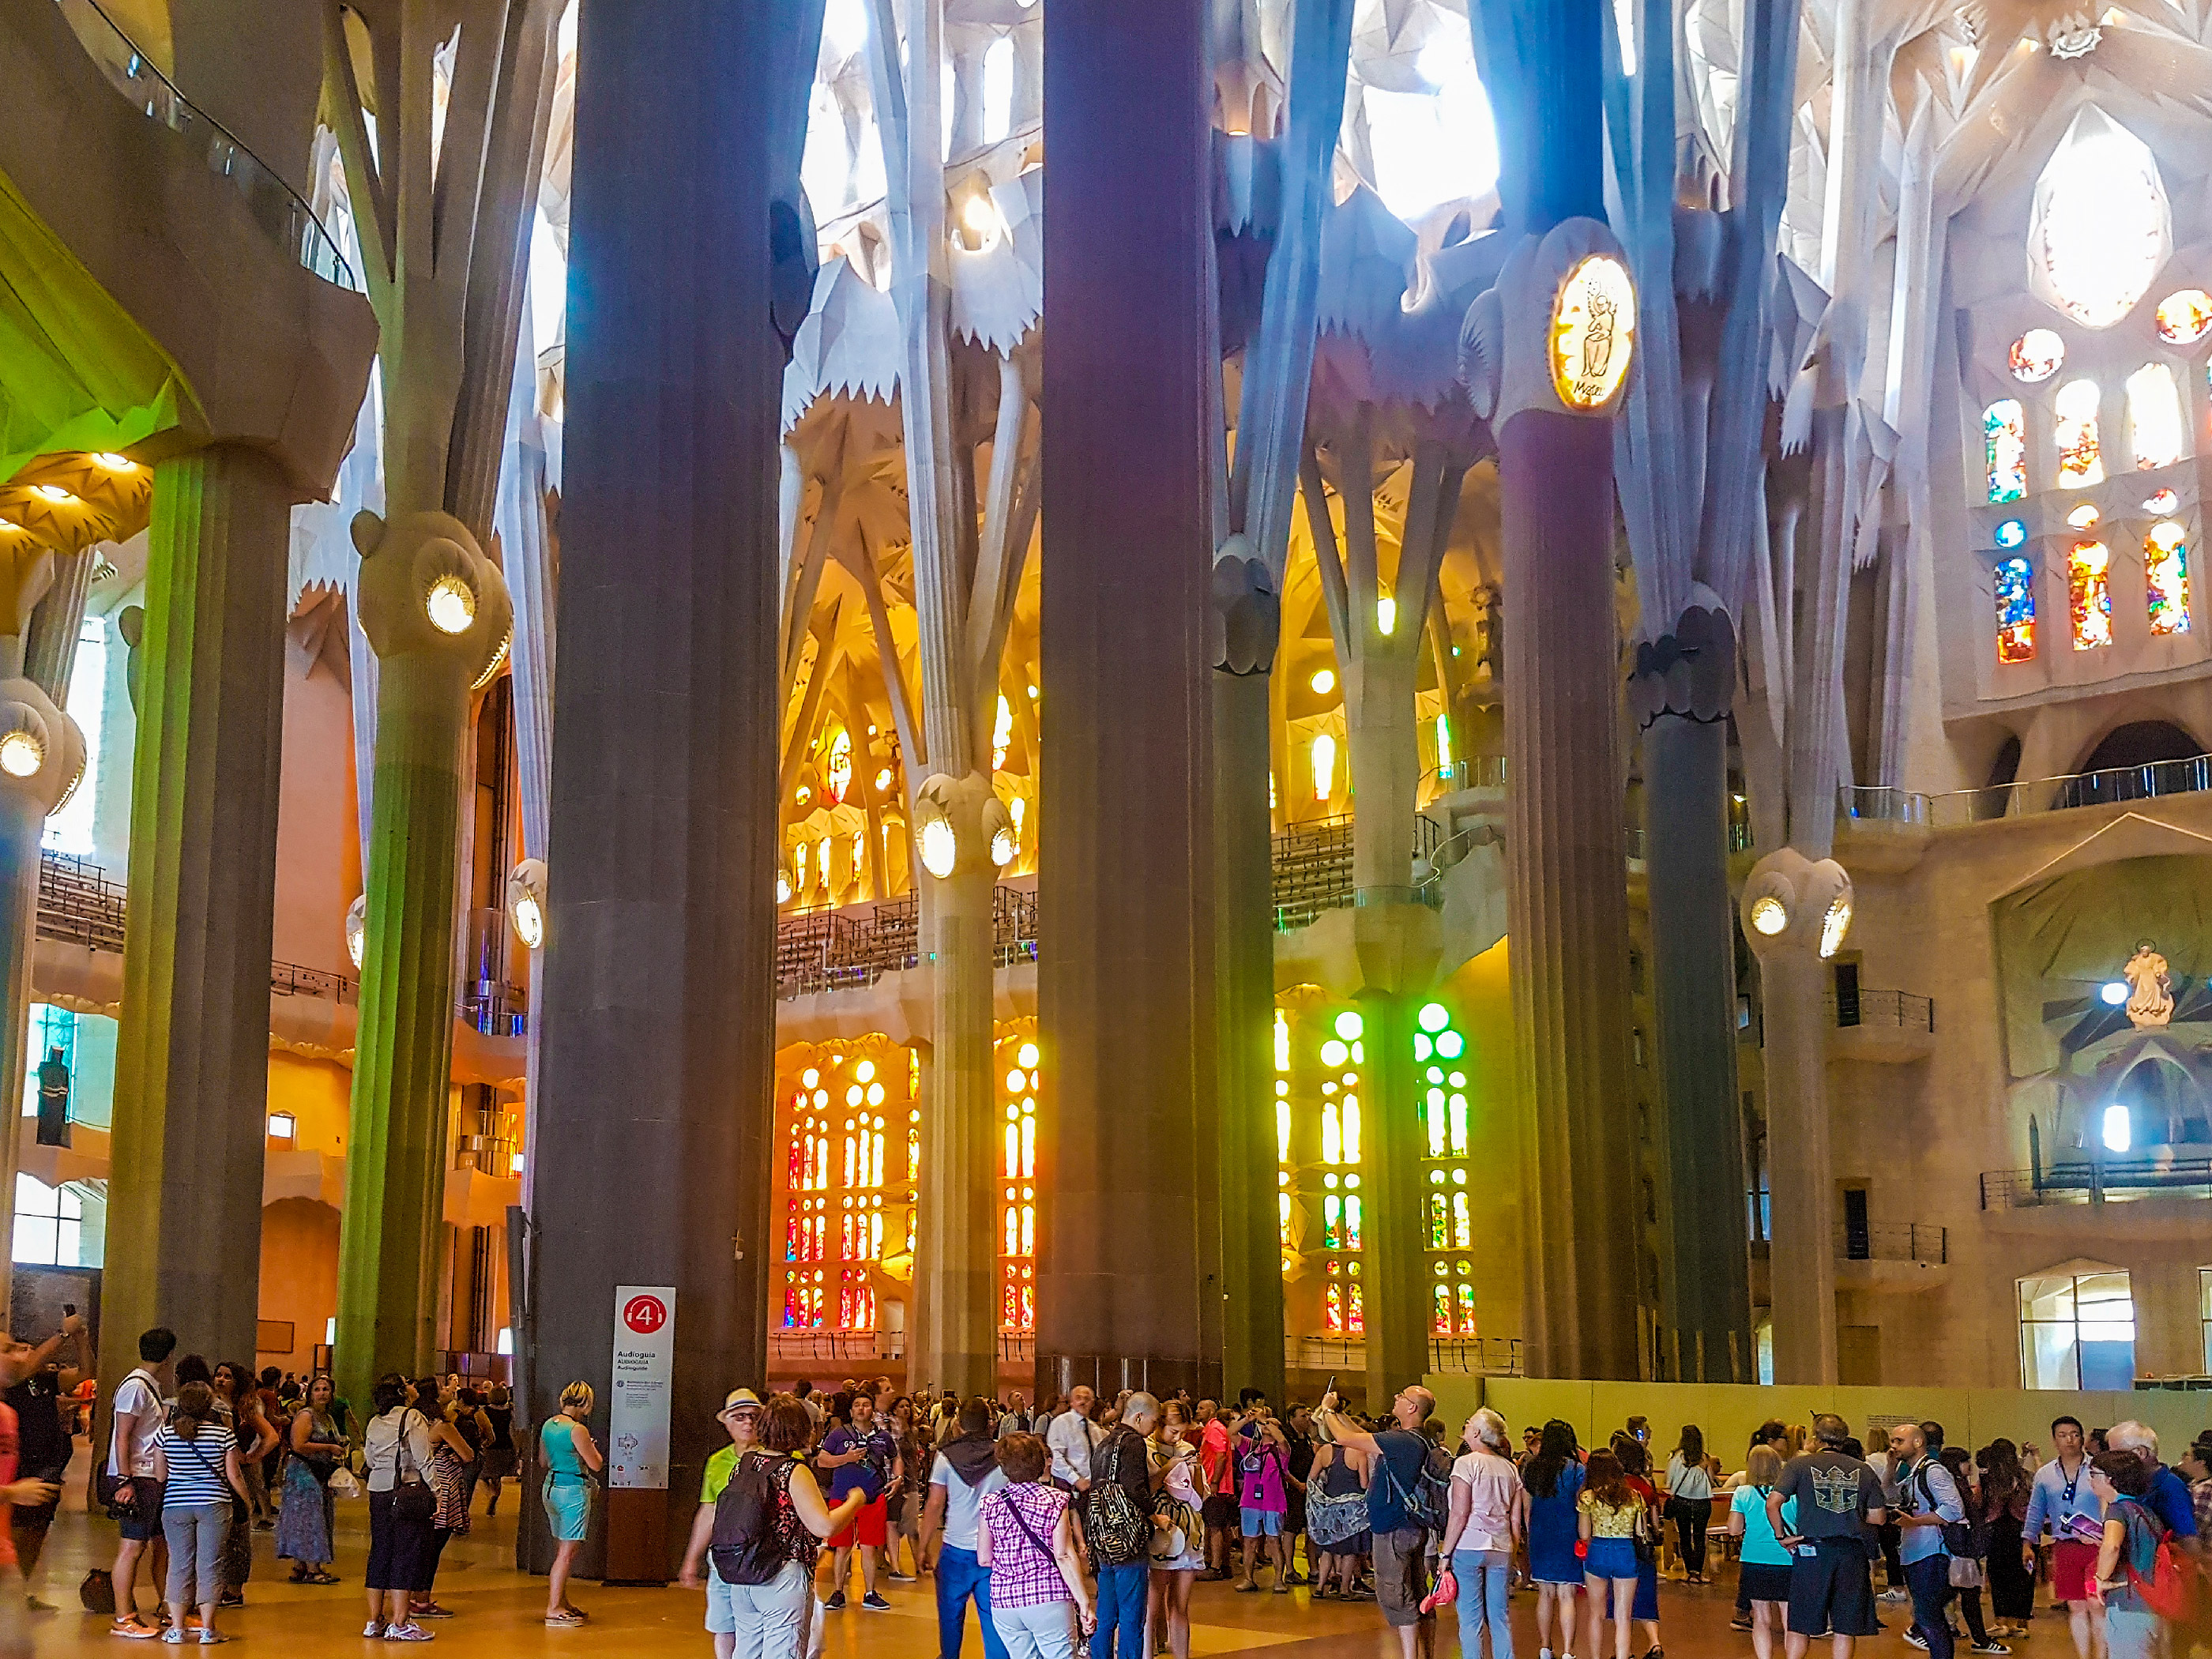 Tourists inside the Sagrada Familia Cathedral, designed by Antoni Gaudi, UNESCO World heritage site, Barcelona, Spain